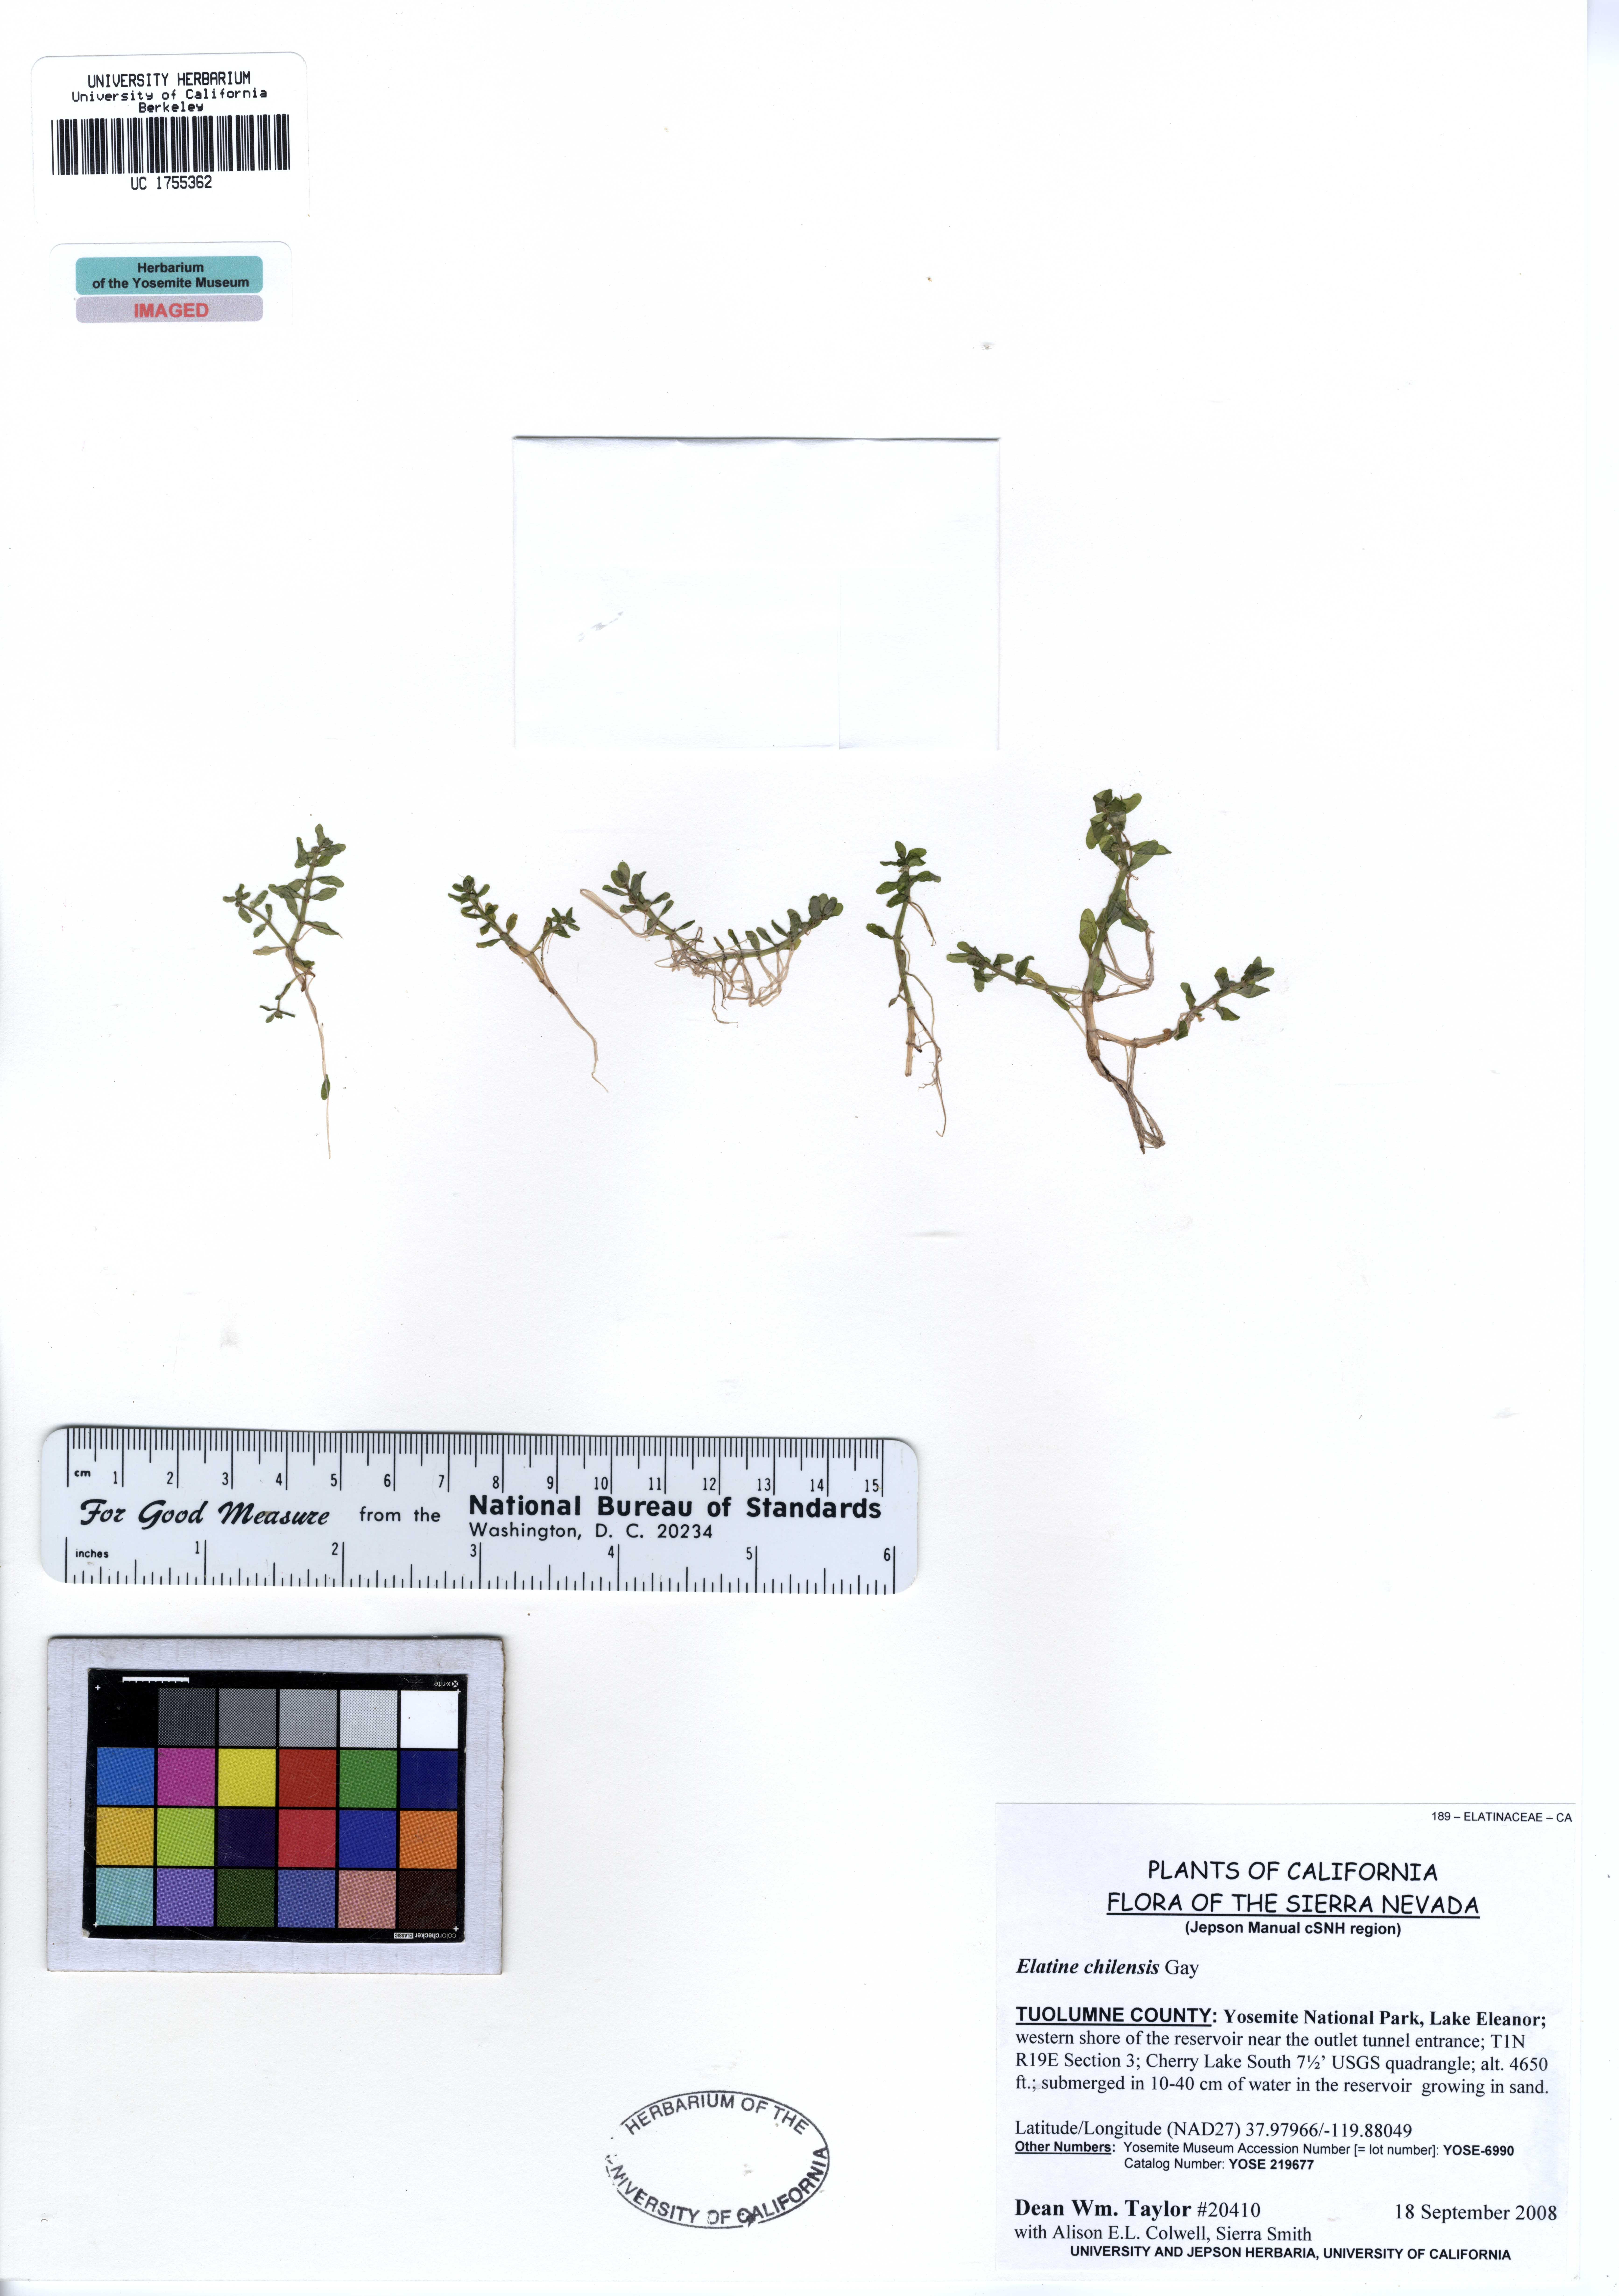 Elatine chilensis Naudin (Syn. Elatine triandra Schkuhr, Elatine triandra var. brachysperma (A. Gray) Fassett) (+ sub-taxa) Date 22 March 2011, 15:16:52